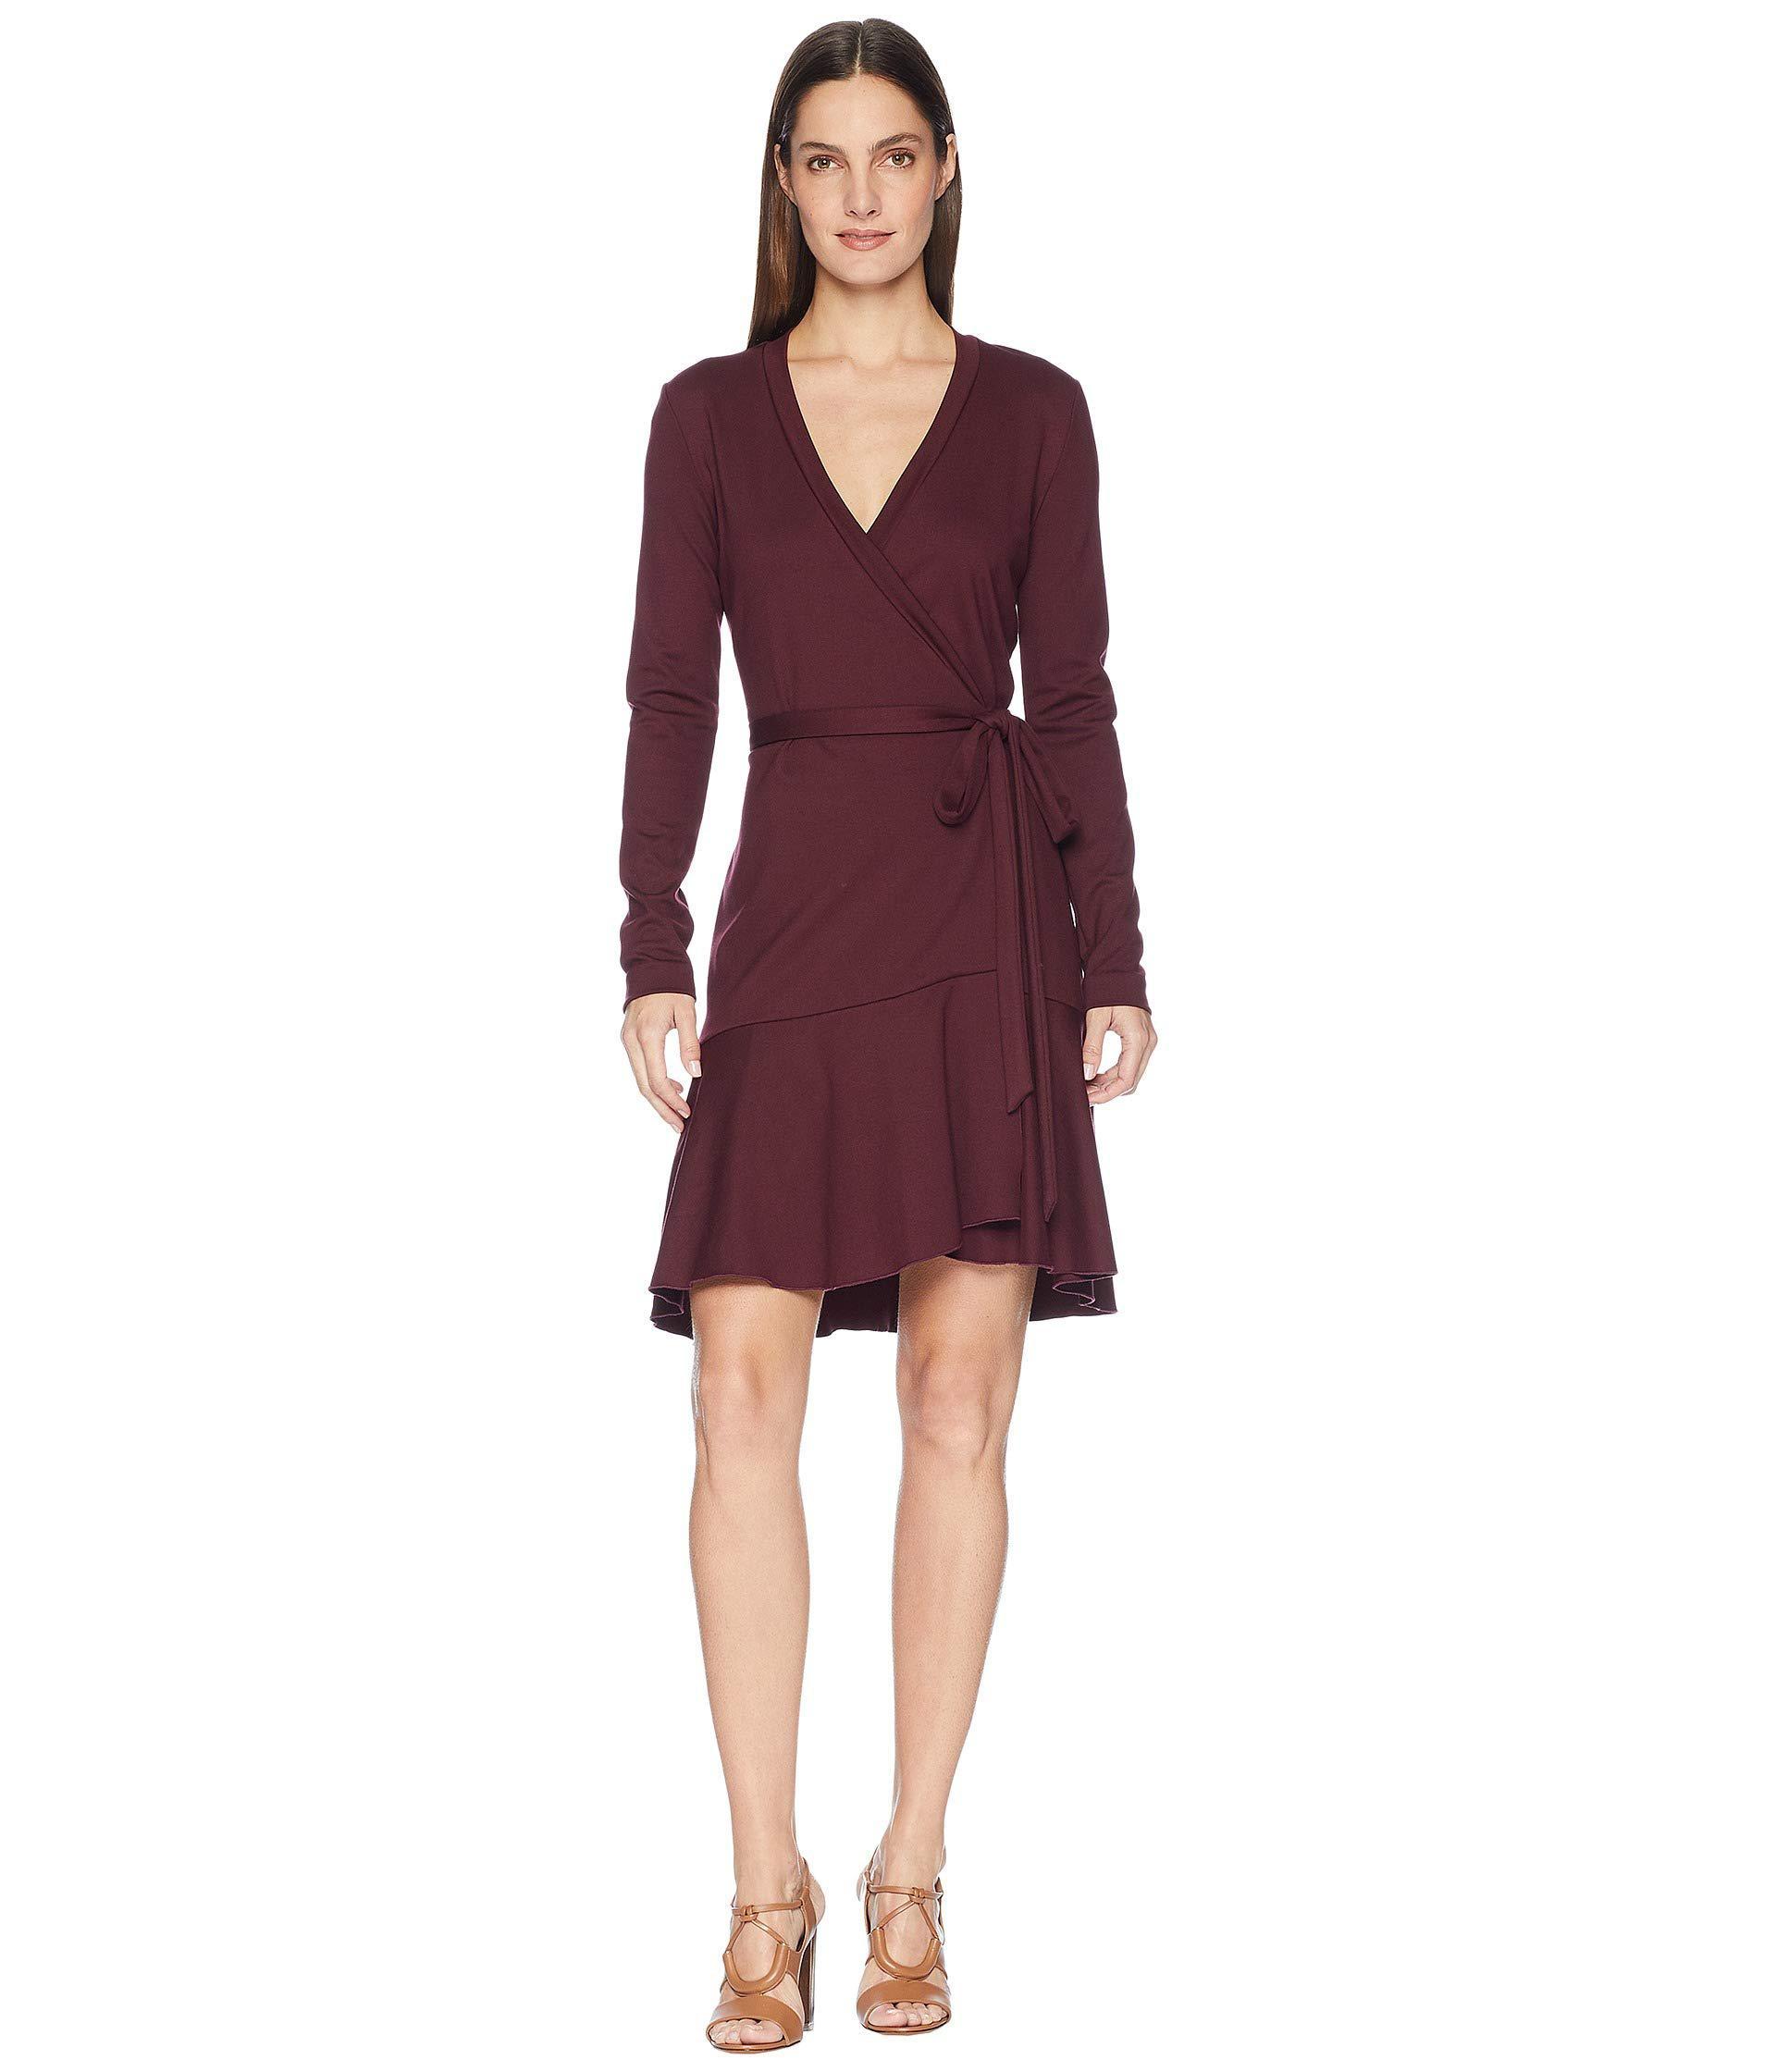 def34dc2bb9 Lyst - Nicole Miller Wrap Dress in Purple - Save 44%